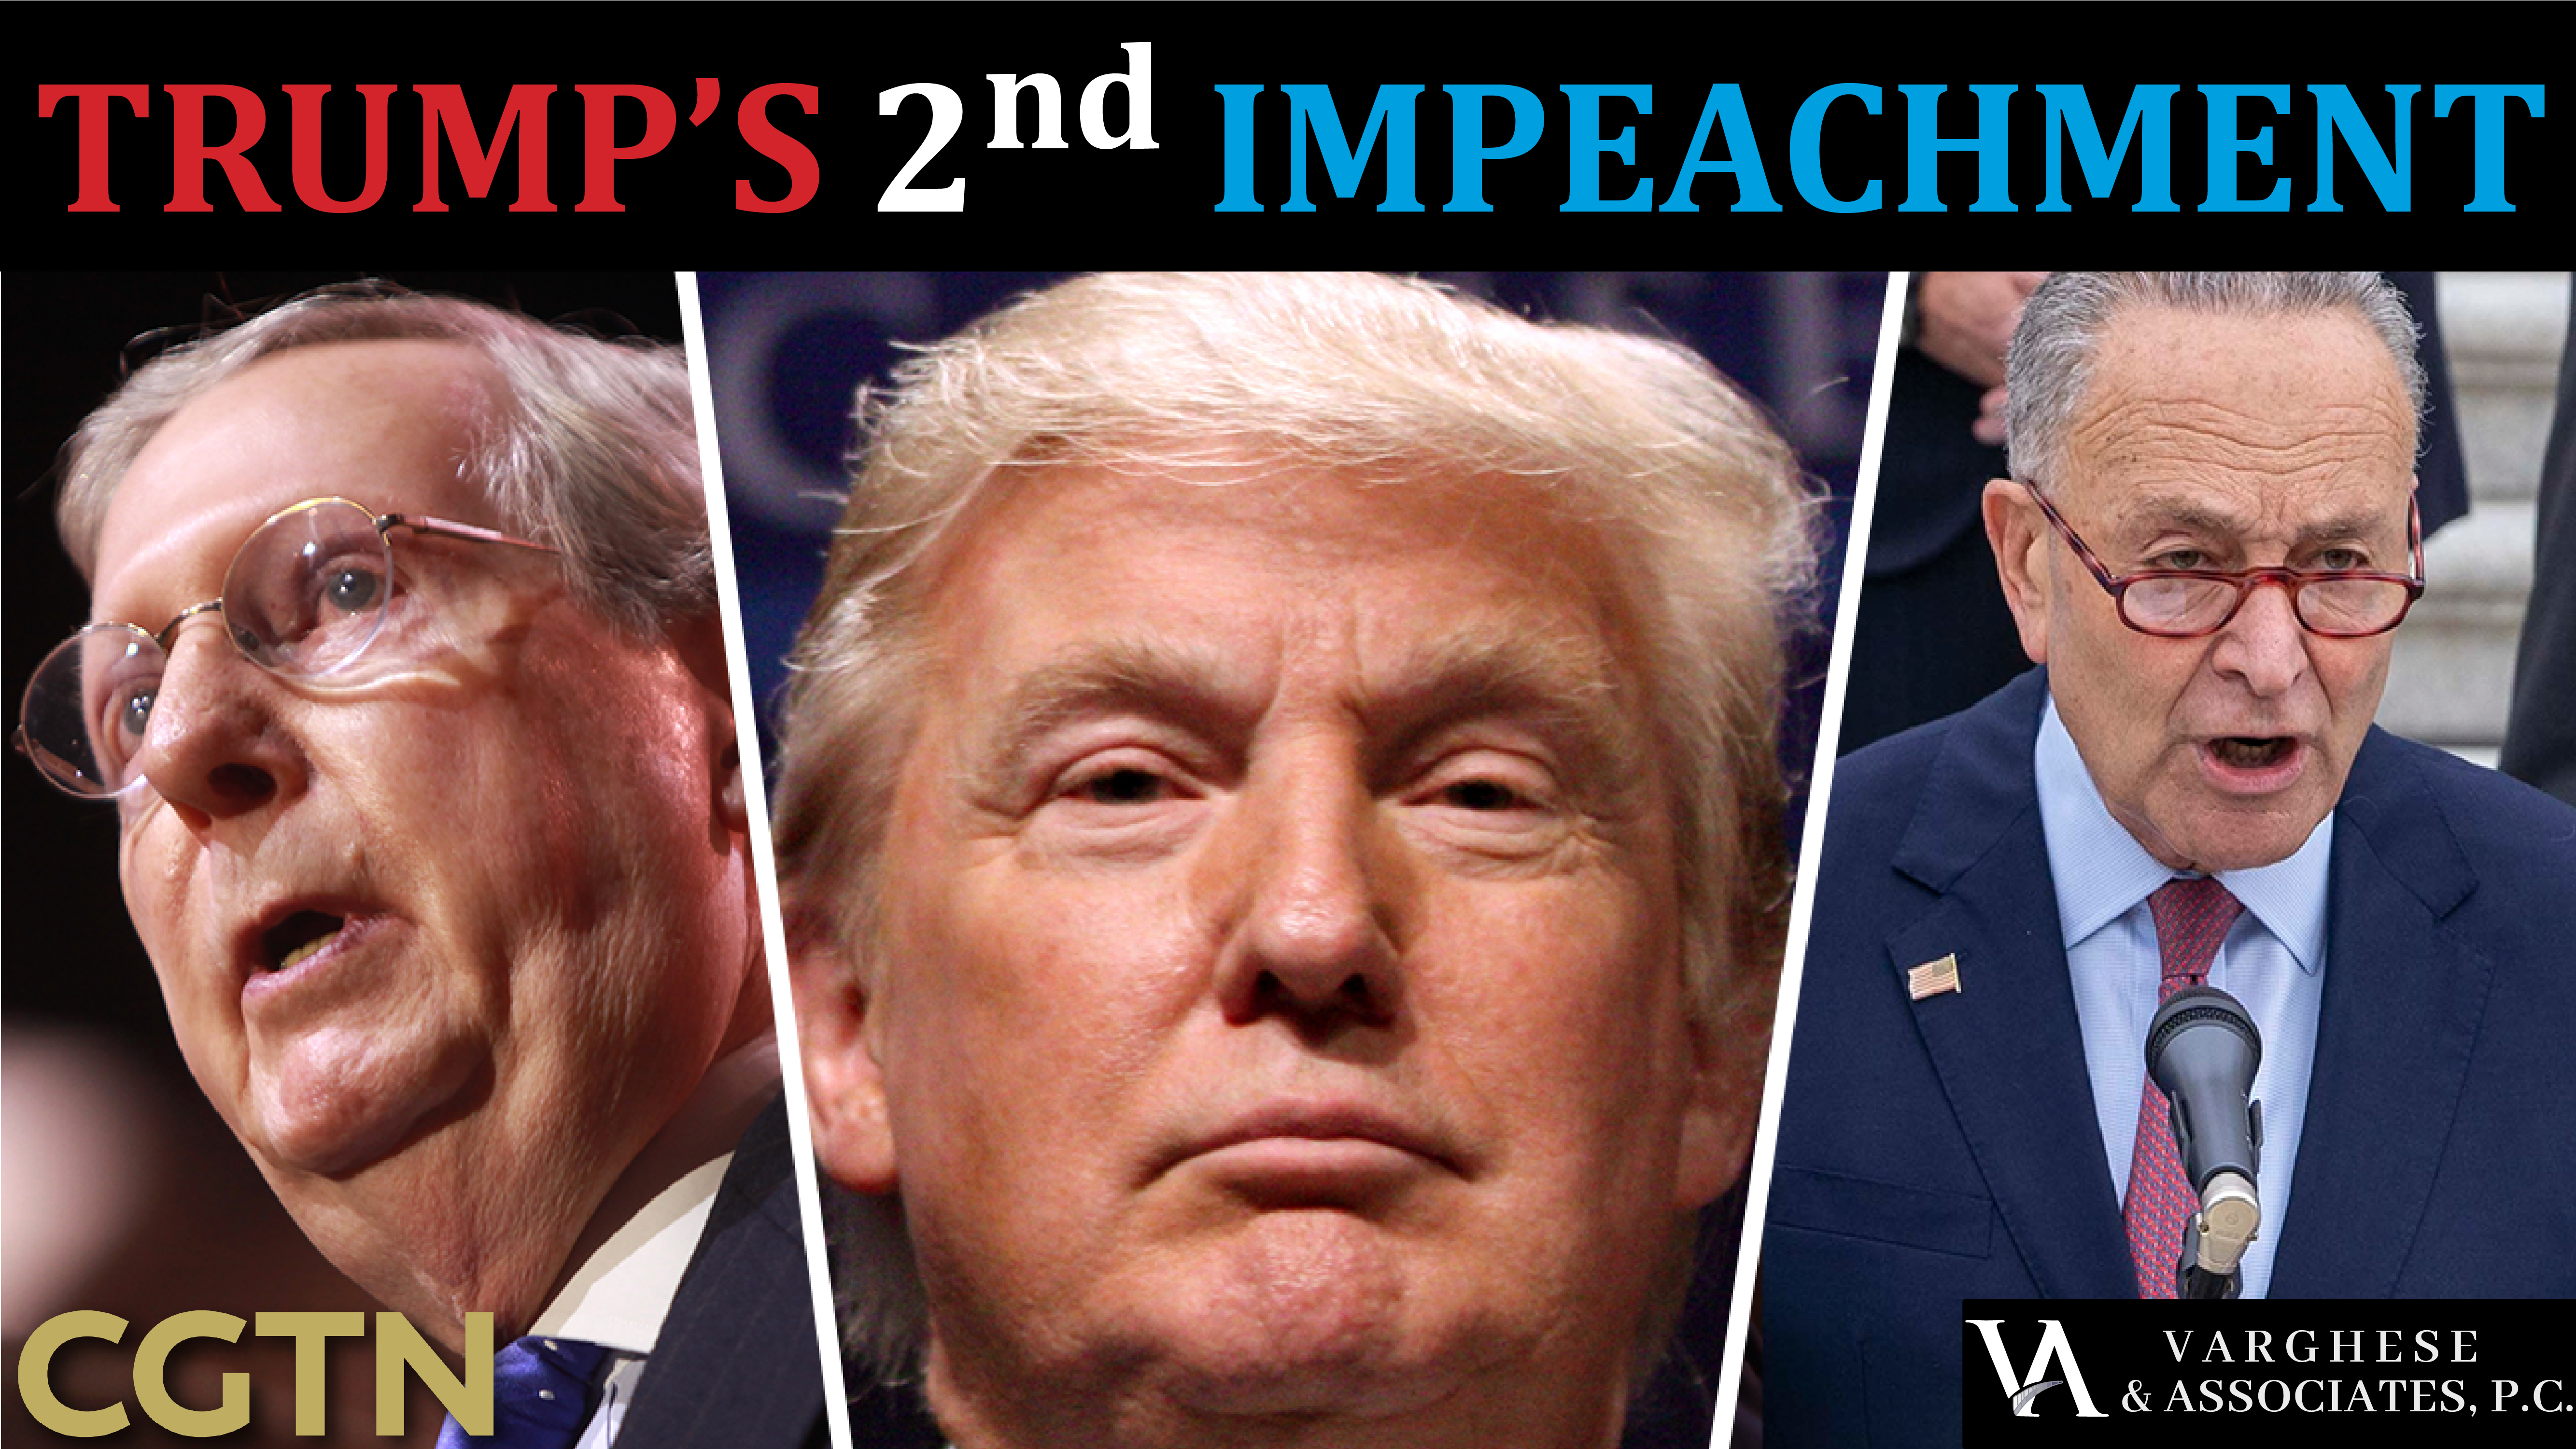 CGTN Trump Impeachment Thumbnail-02